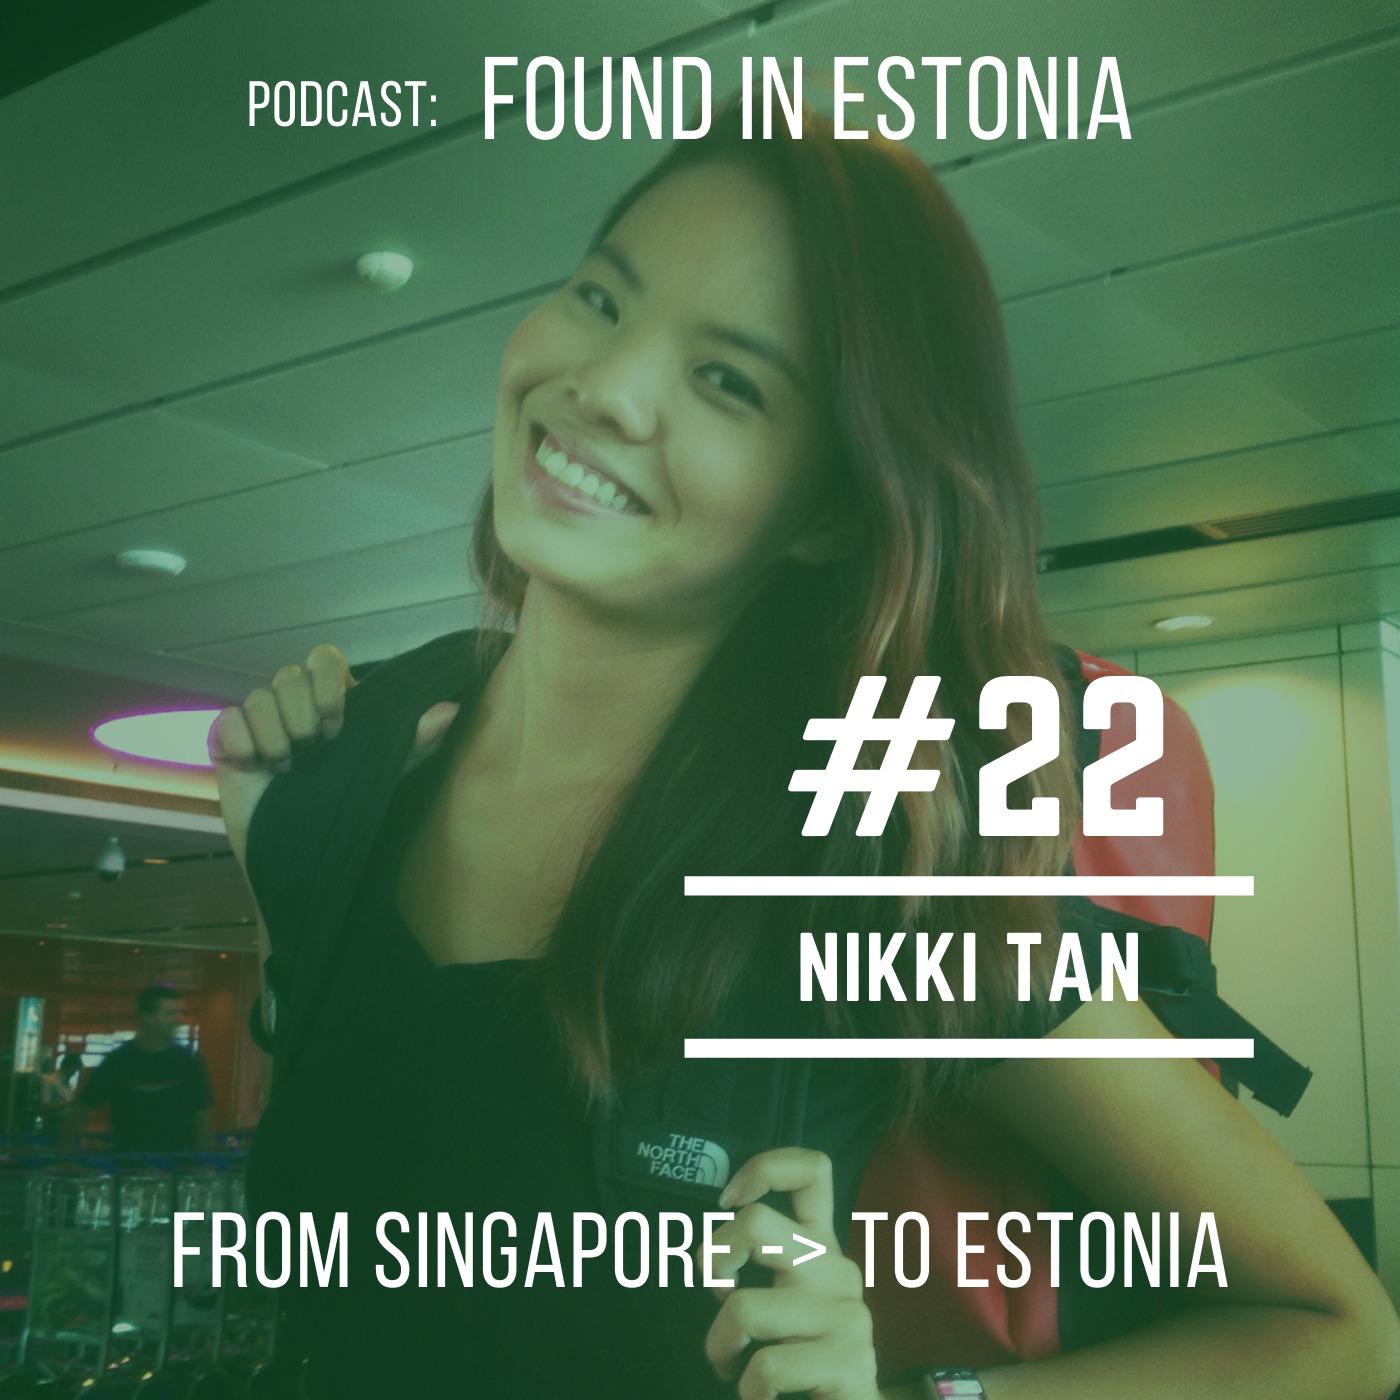 #22 Nikki Tan from Singapore to Estonia